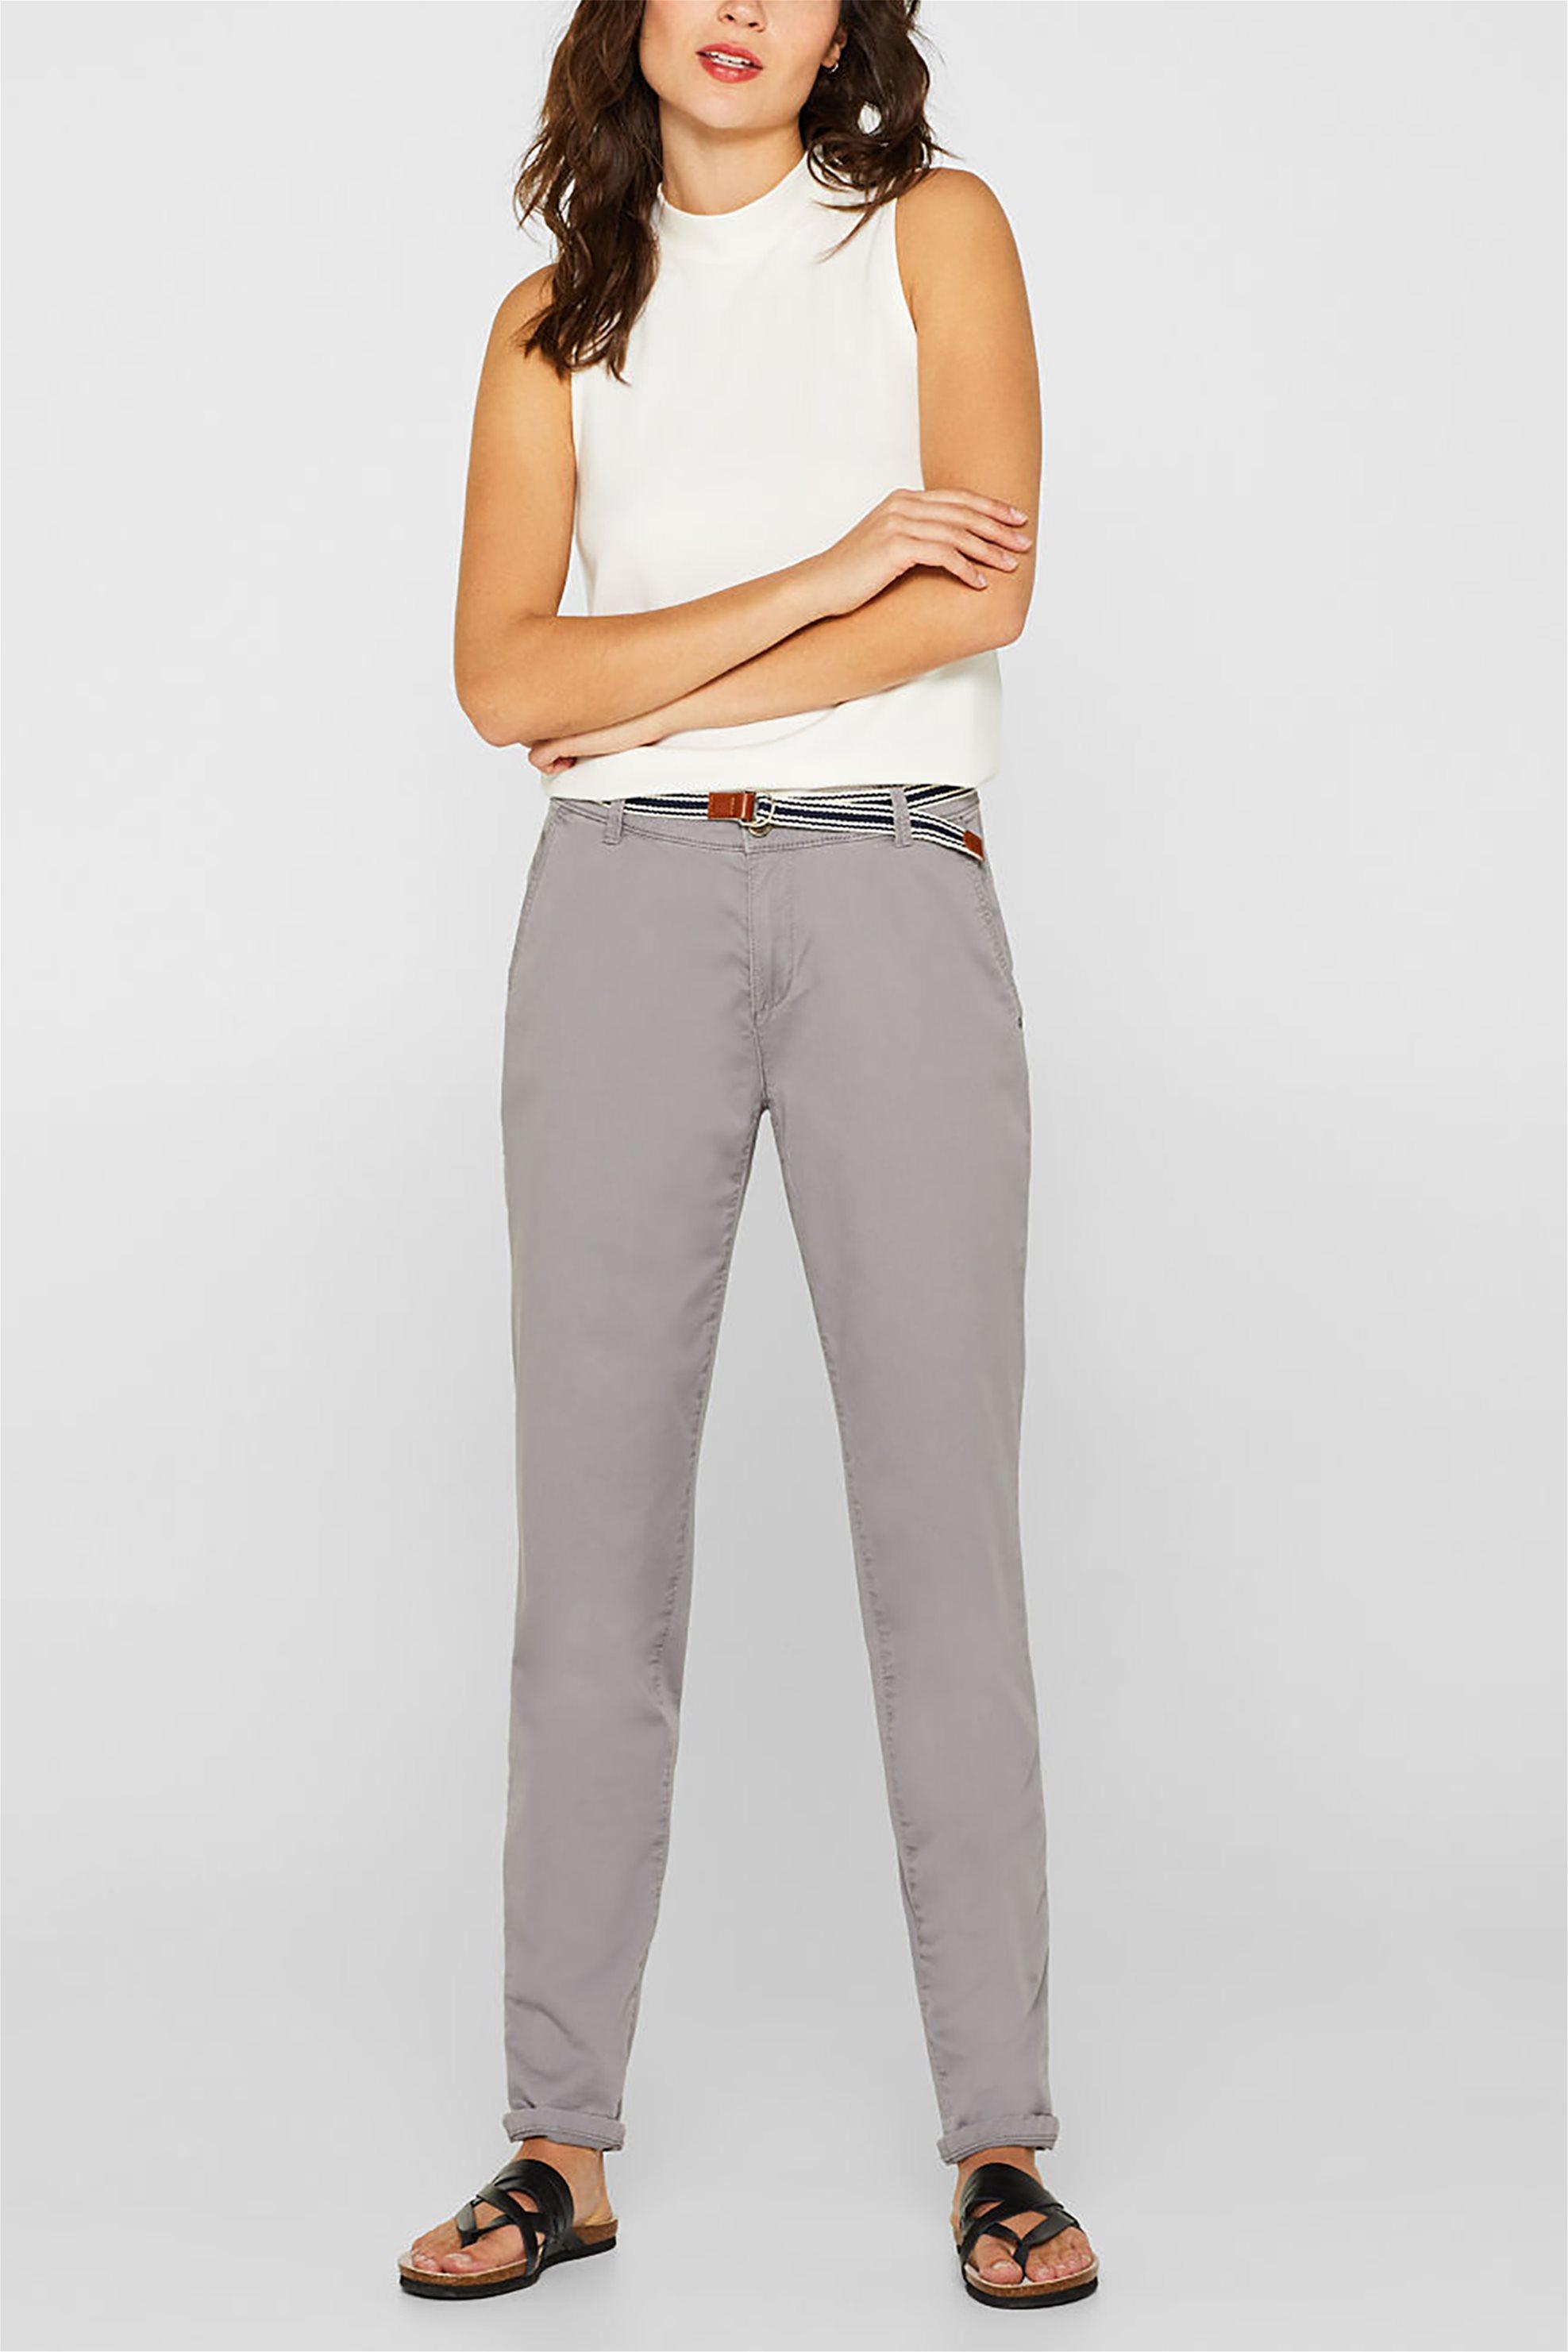 14847352f670 Esprit γυναικείο chinos παντελόνι με ριγέ ζώνη - 999EE1B800 - Γκρι